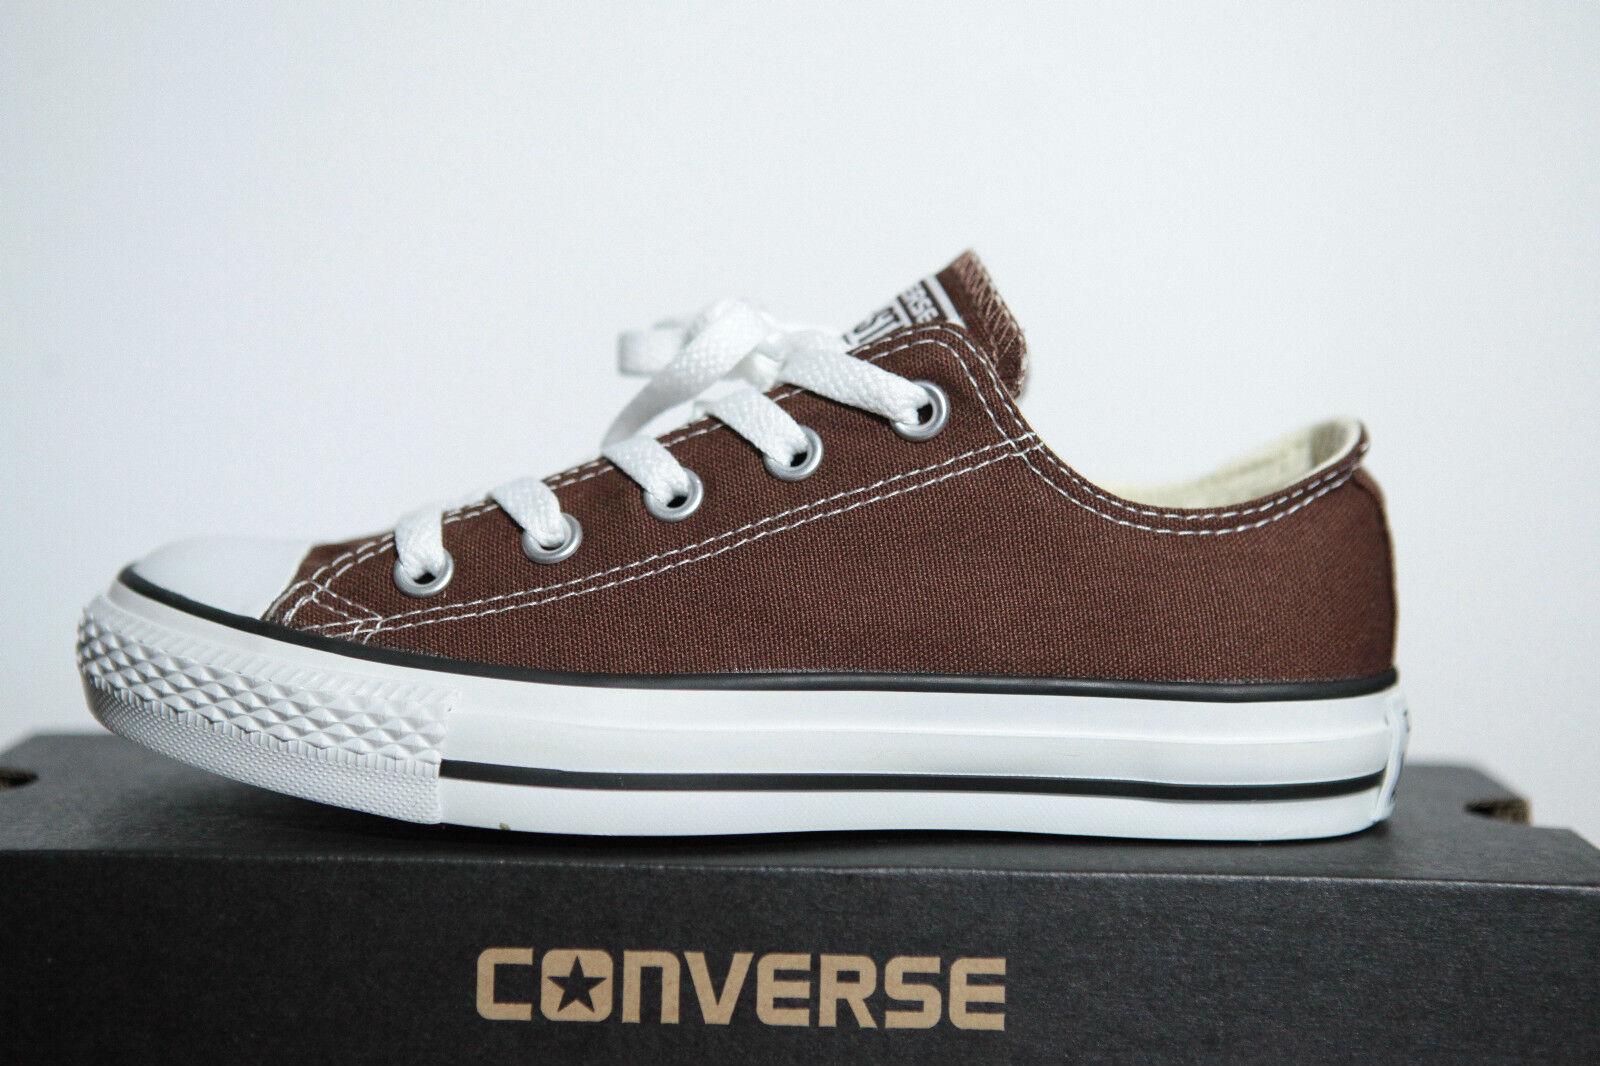 Neu All Star Converse Chucks low Sneaker OX Can Chocolate 1Q112 (65) Gr.36,5